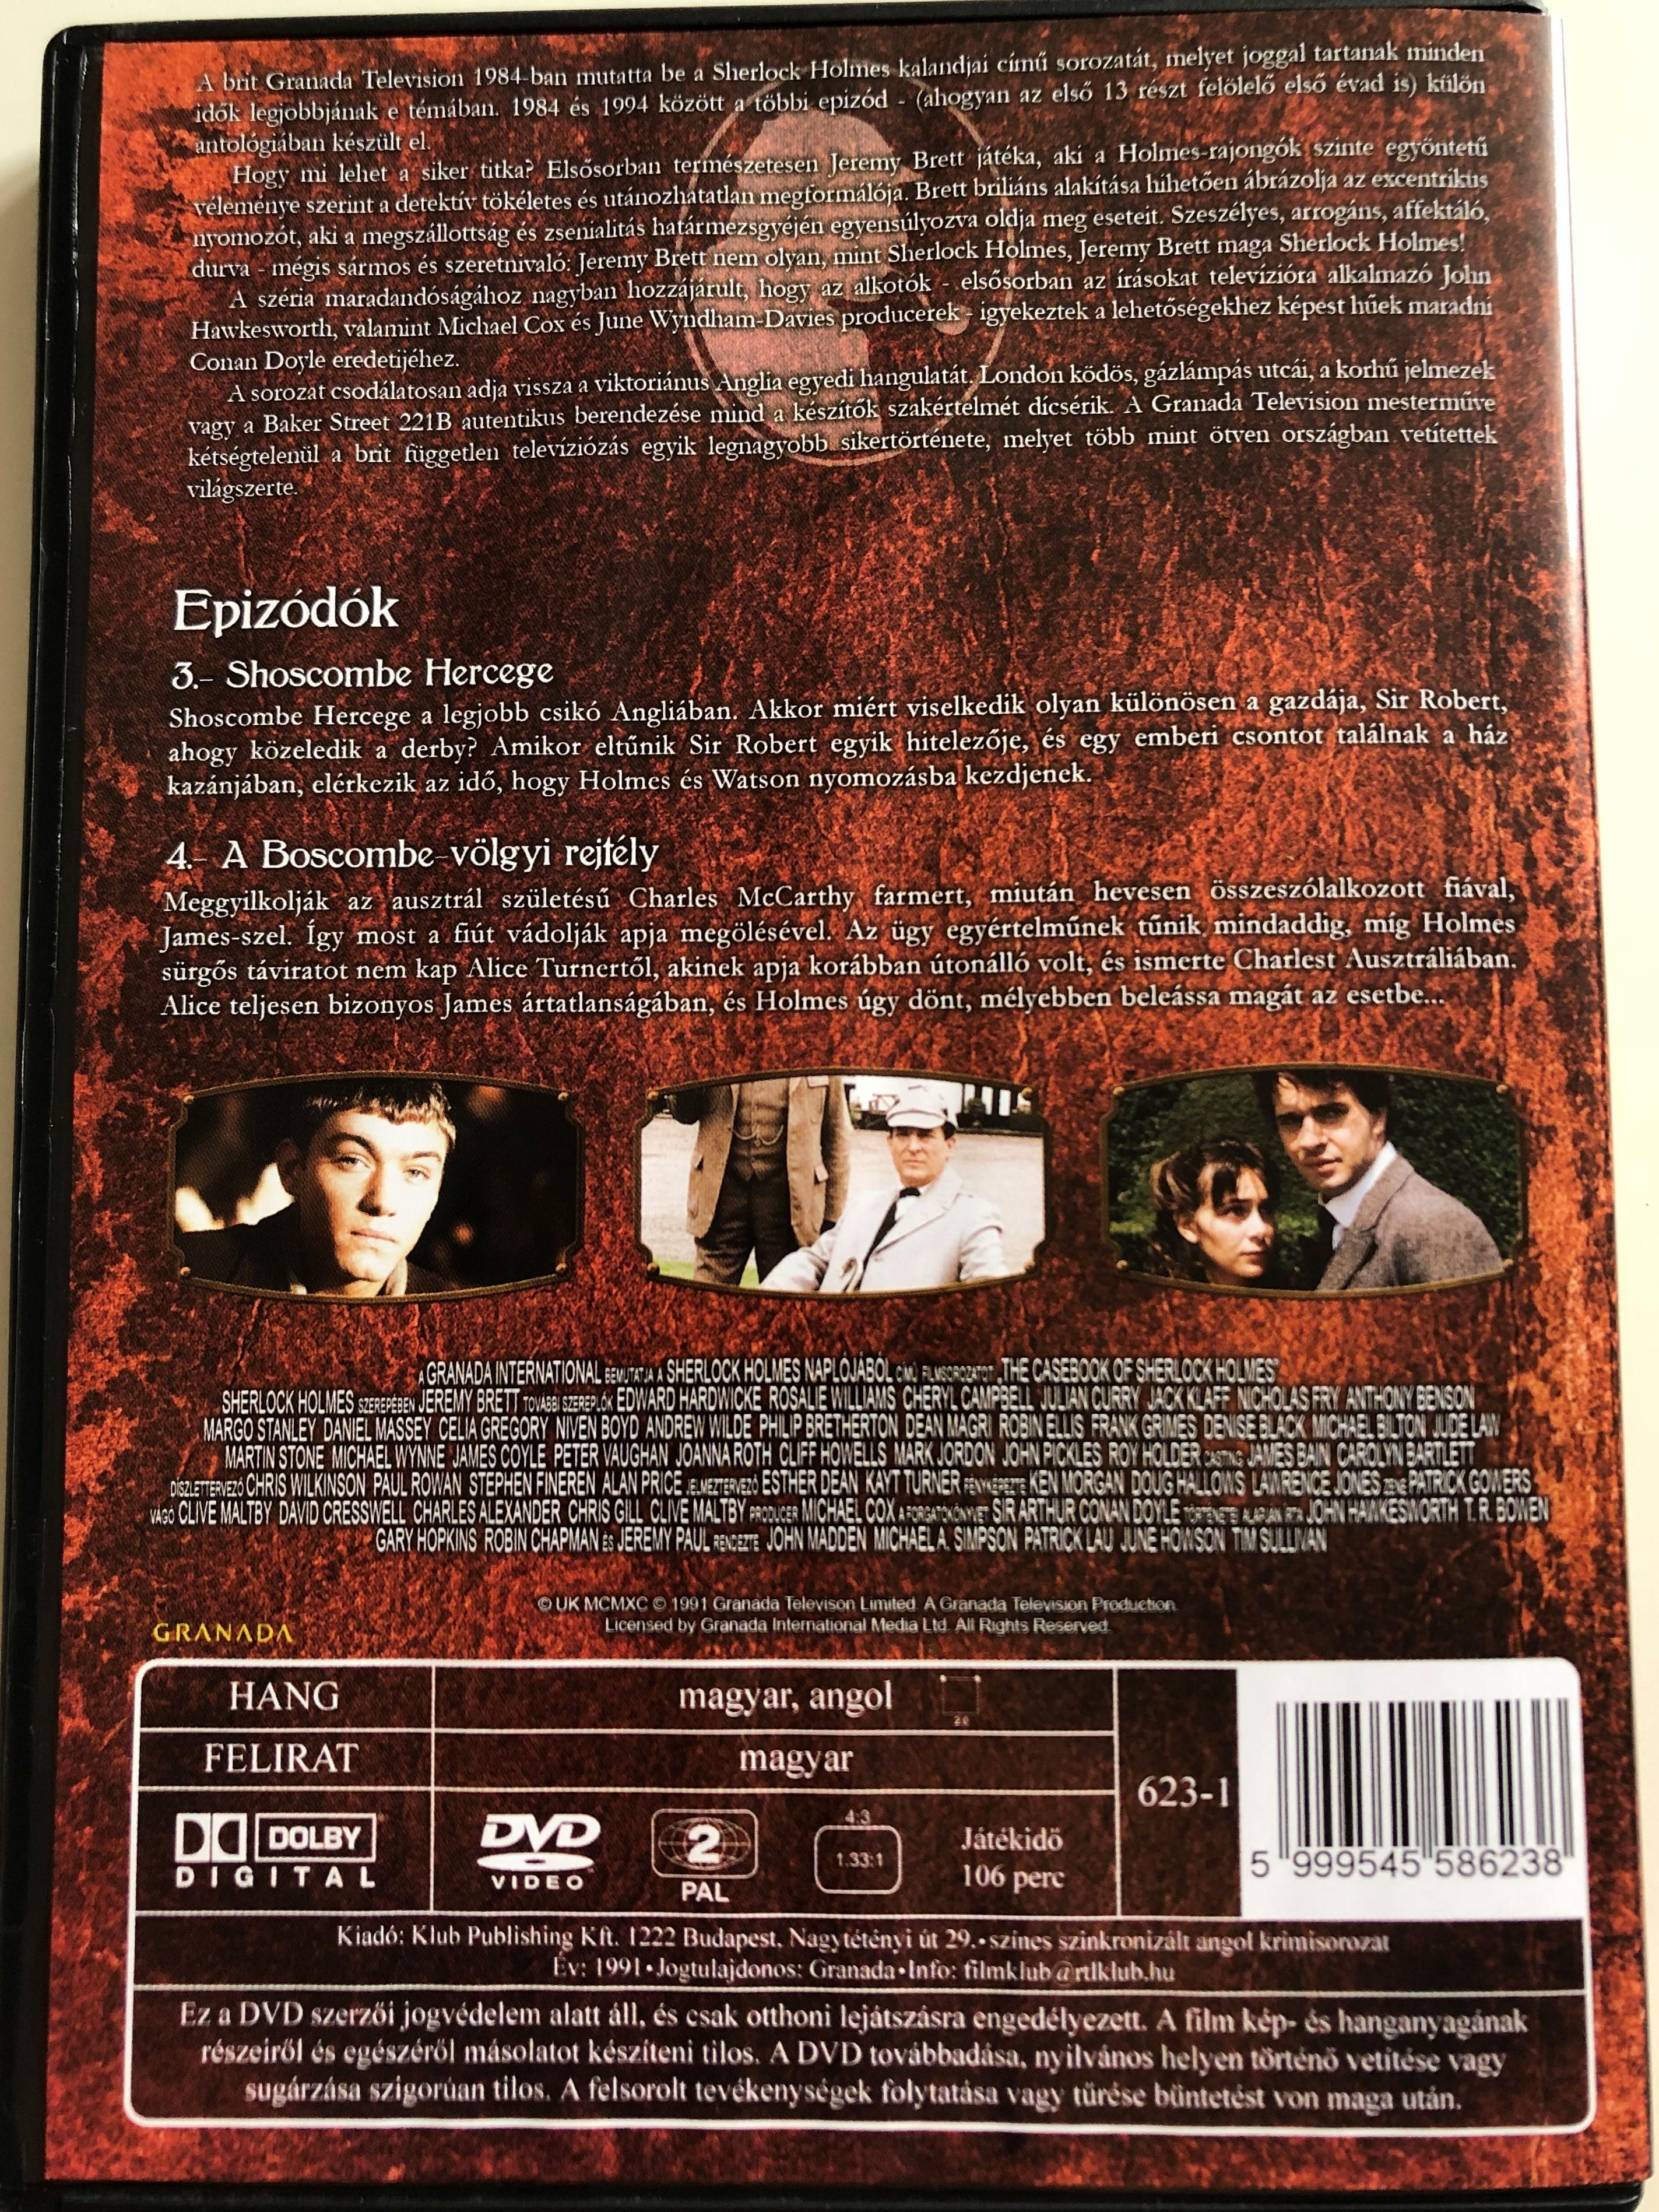 the-casebook-of-sherlock-holmes-dvd-1991-sherlock-holmes-napl-j-b-l-directed-by-john-madden-michael-a.-simpson-patrick-lau-june-howson-tim-sullivan-starring-jeremy-brett-edward-hardwicke-rosalie-williams-chery.jpg